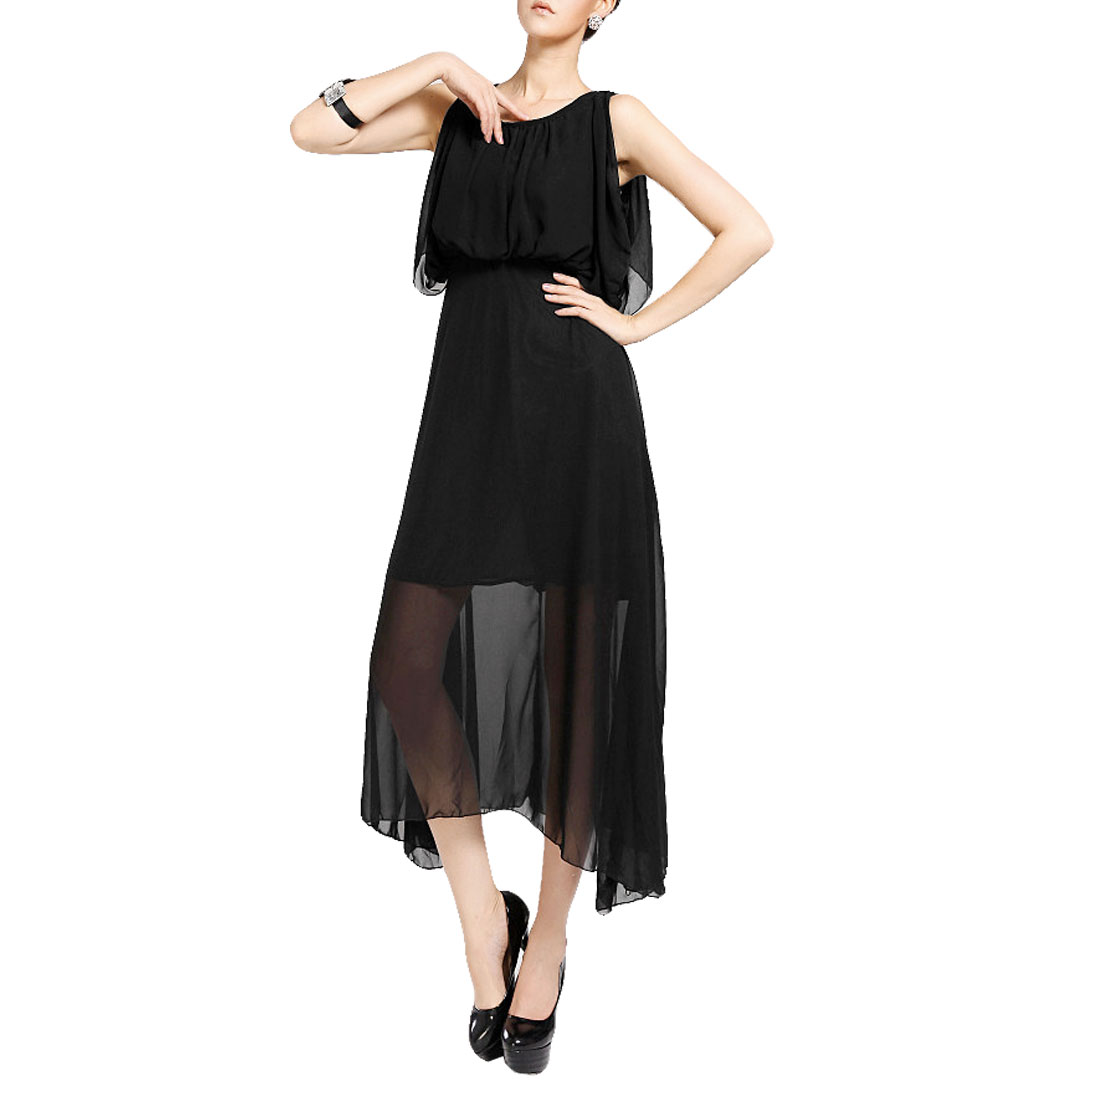 Women Black Round Neck Sleeveless Summer Maxi Dress S